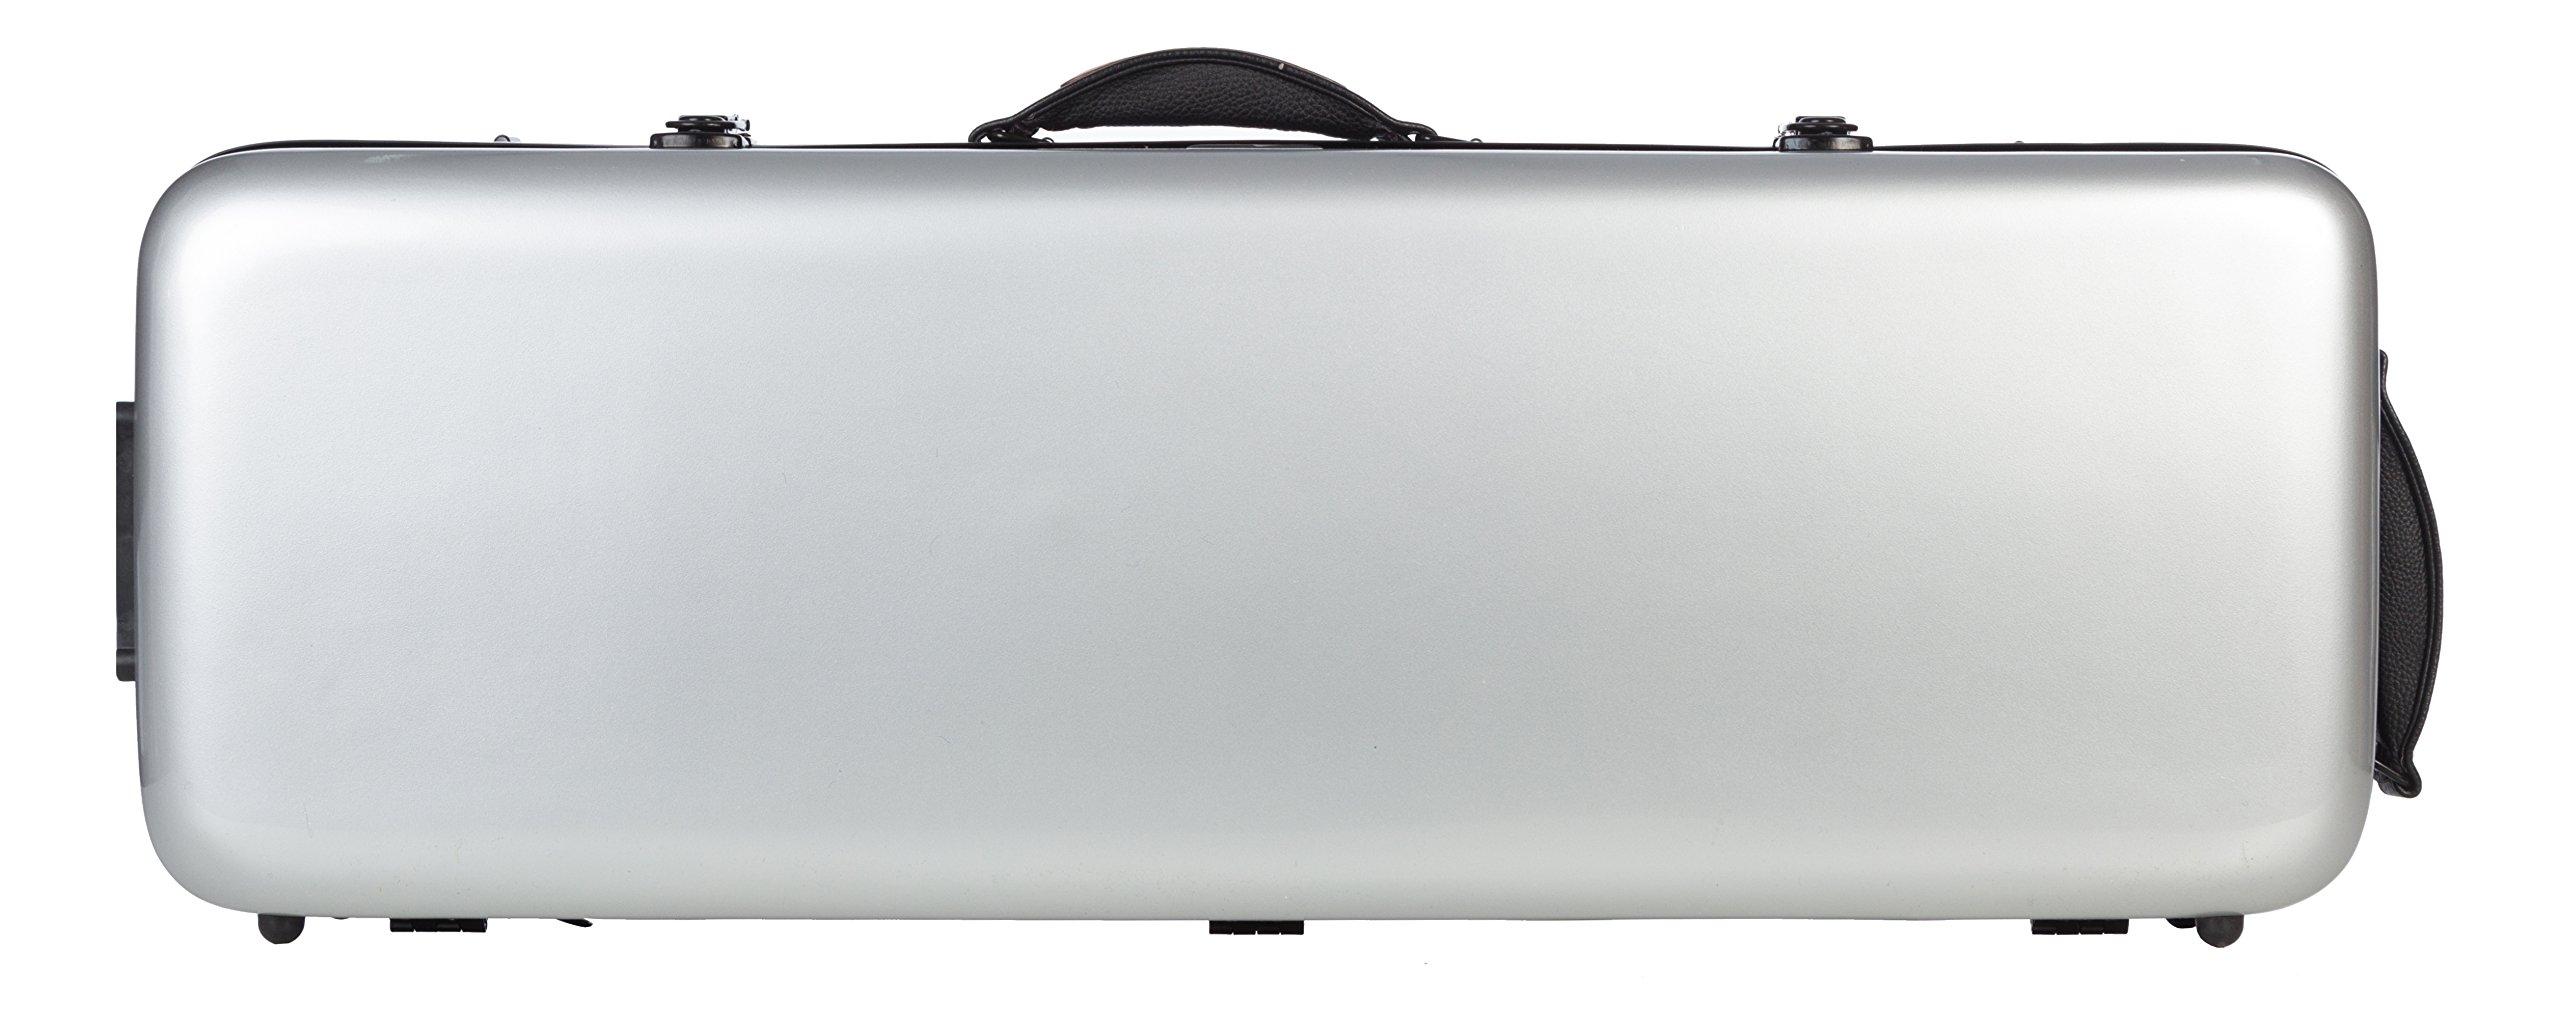 Estuche de viola fibra Oblong 38-43 Plata M-Case + music bag: Amazon.es: Instrumentos musicales